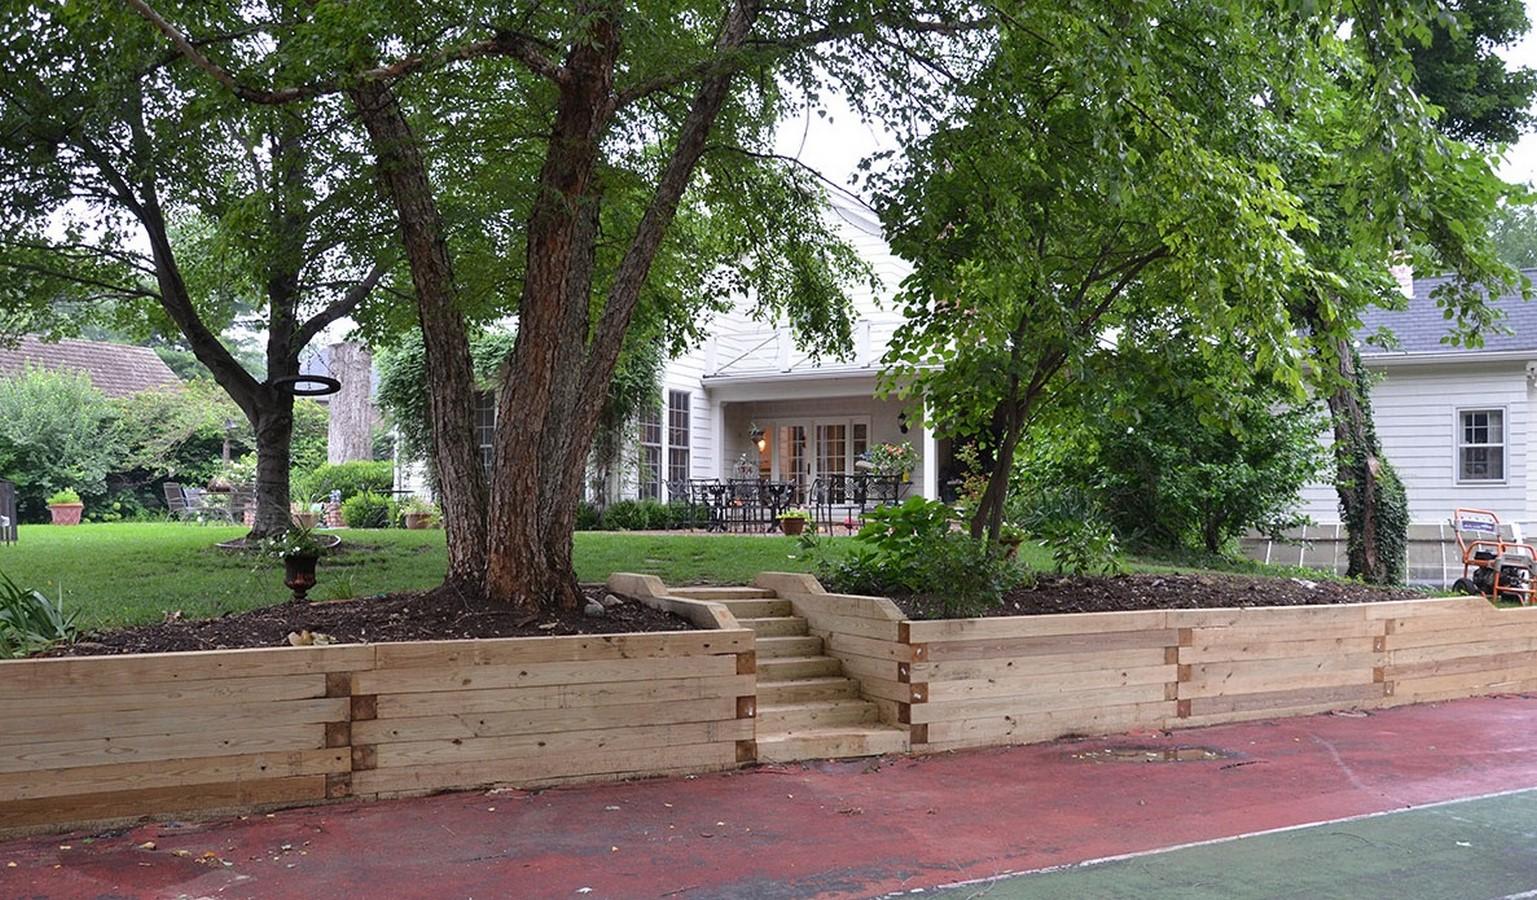 Architects in Kansas city - Top 90 Architects in Kansas city - Sheet53